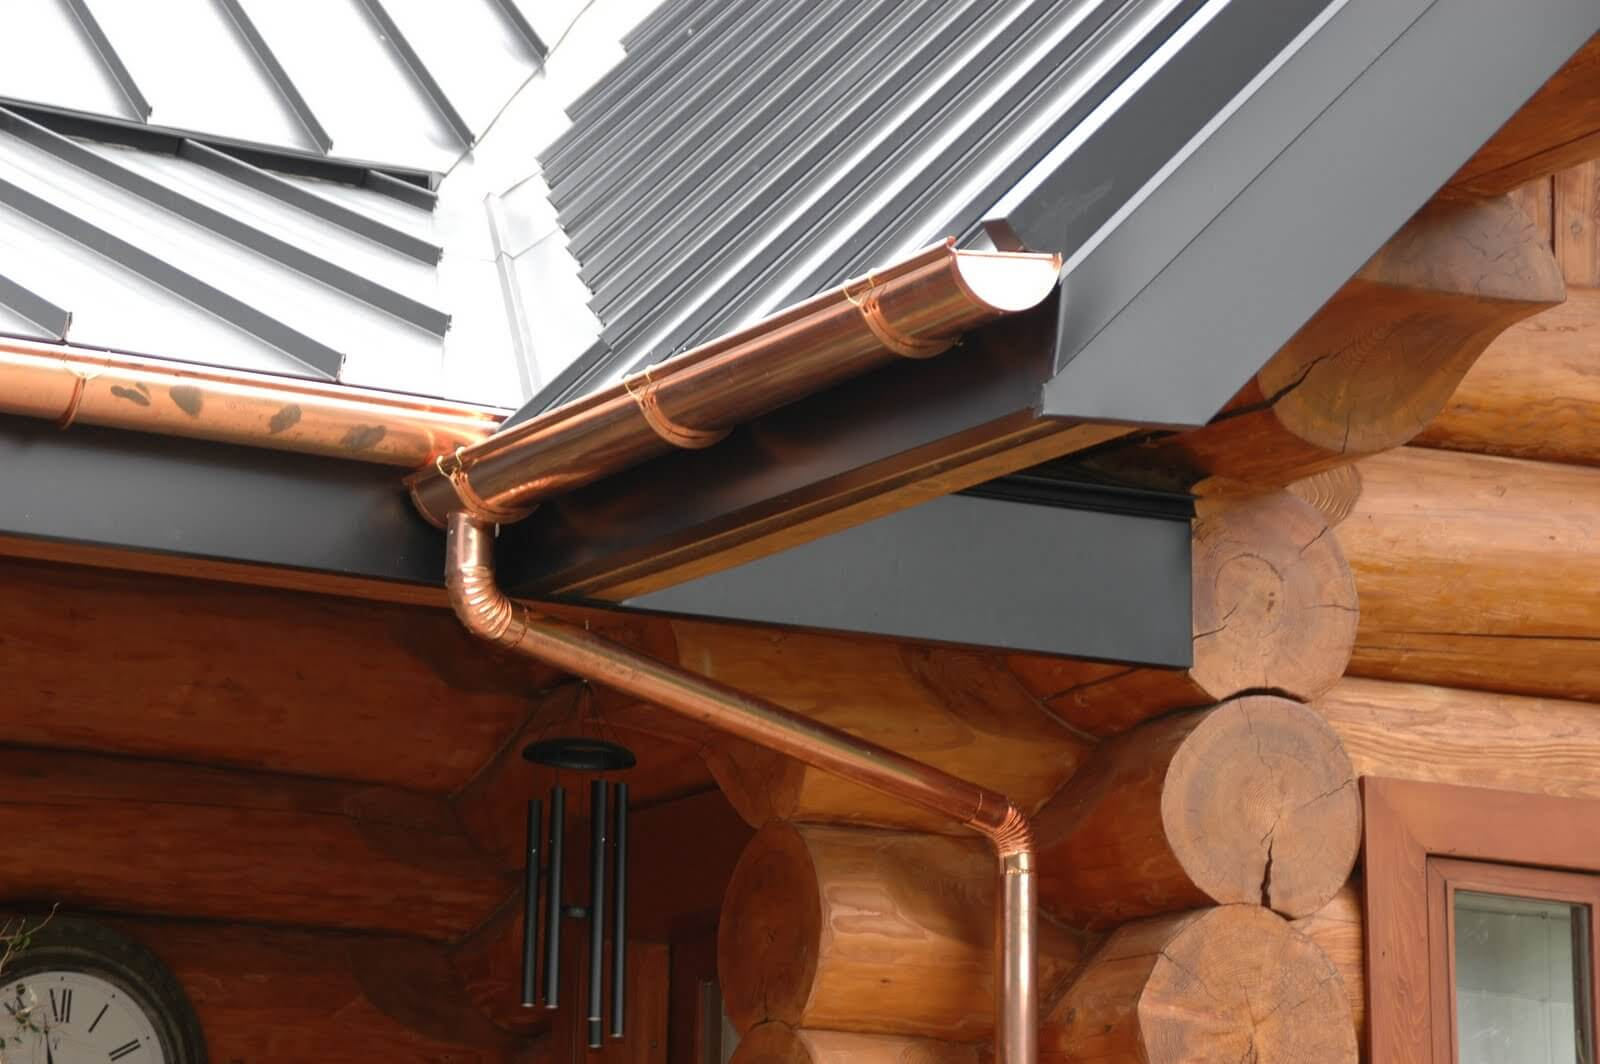 Copper Drain System